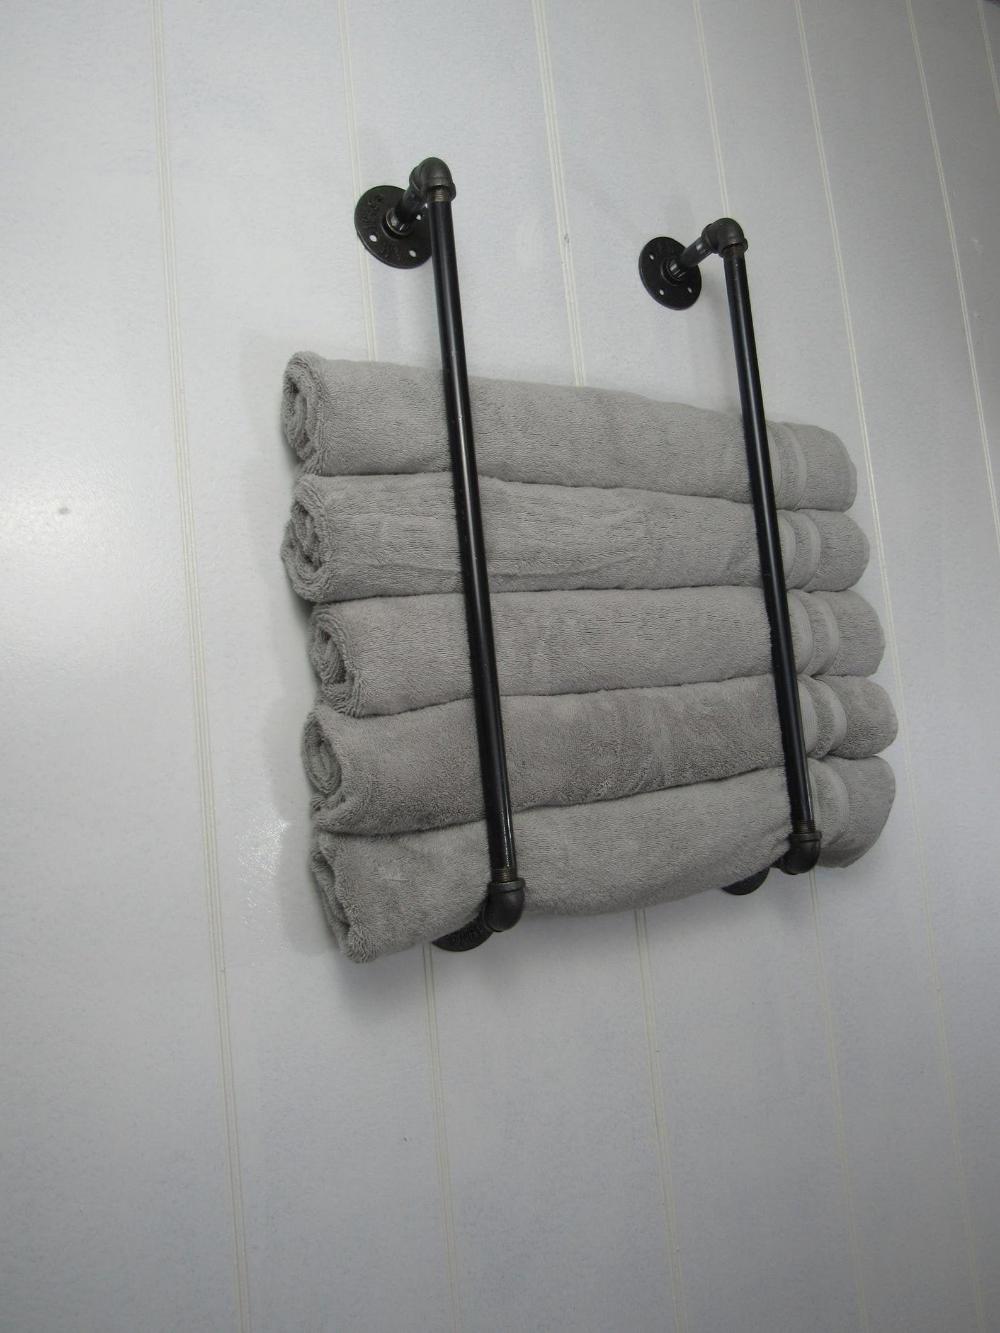 Bathroom Decor Discover Vertical Towel Rack Dual Towel Holder Bathroom Towel Holder Beach Towel Storage Ba In 2020 Towel Holder Bathroom Beach Towel Storage Towel Rack